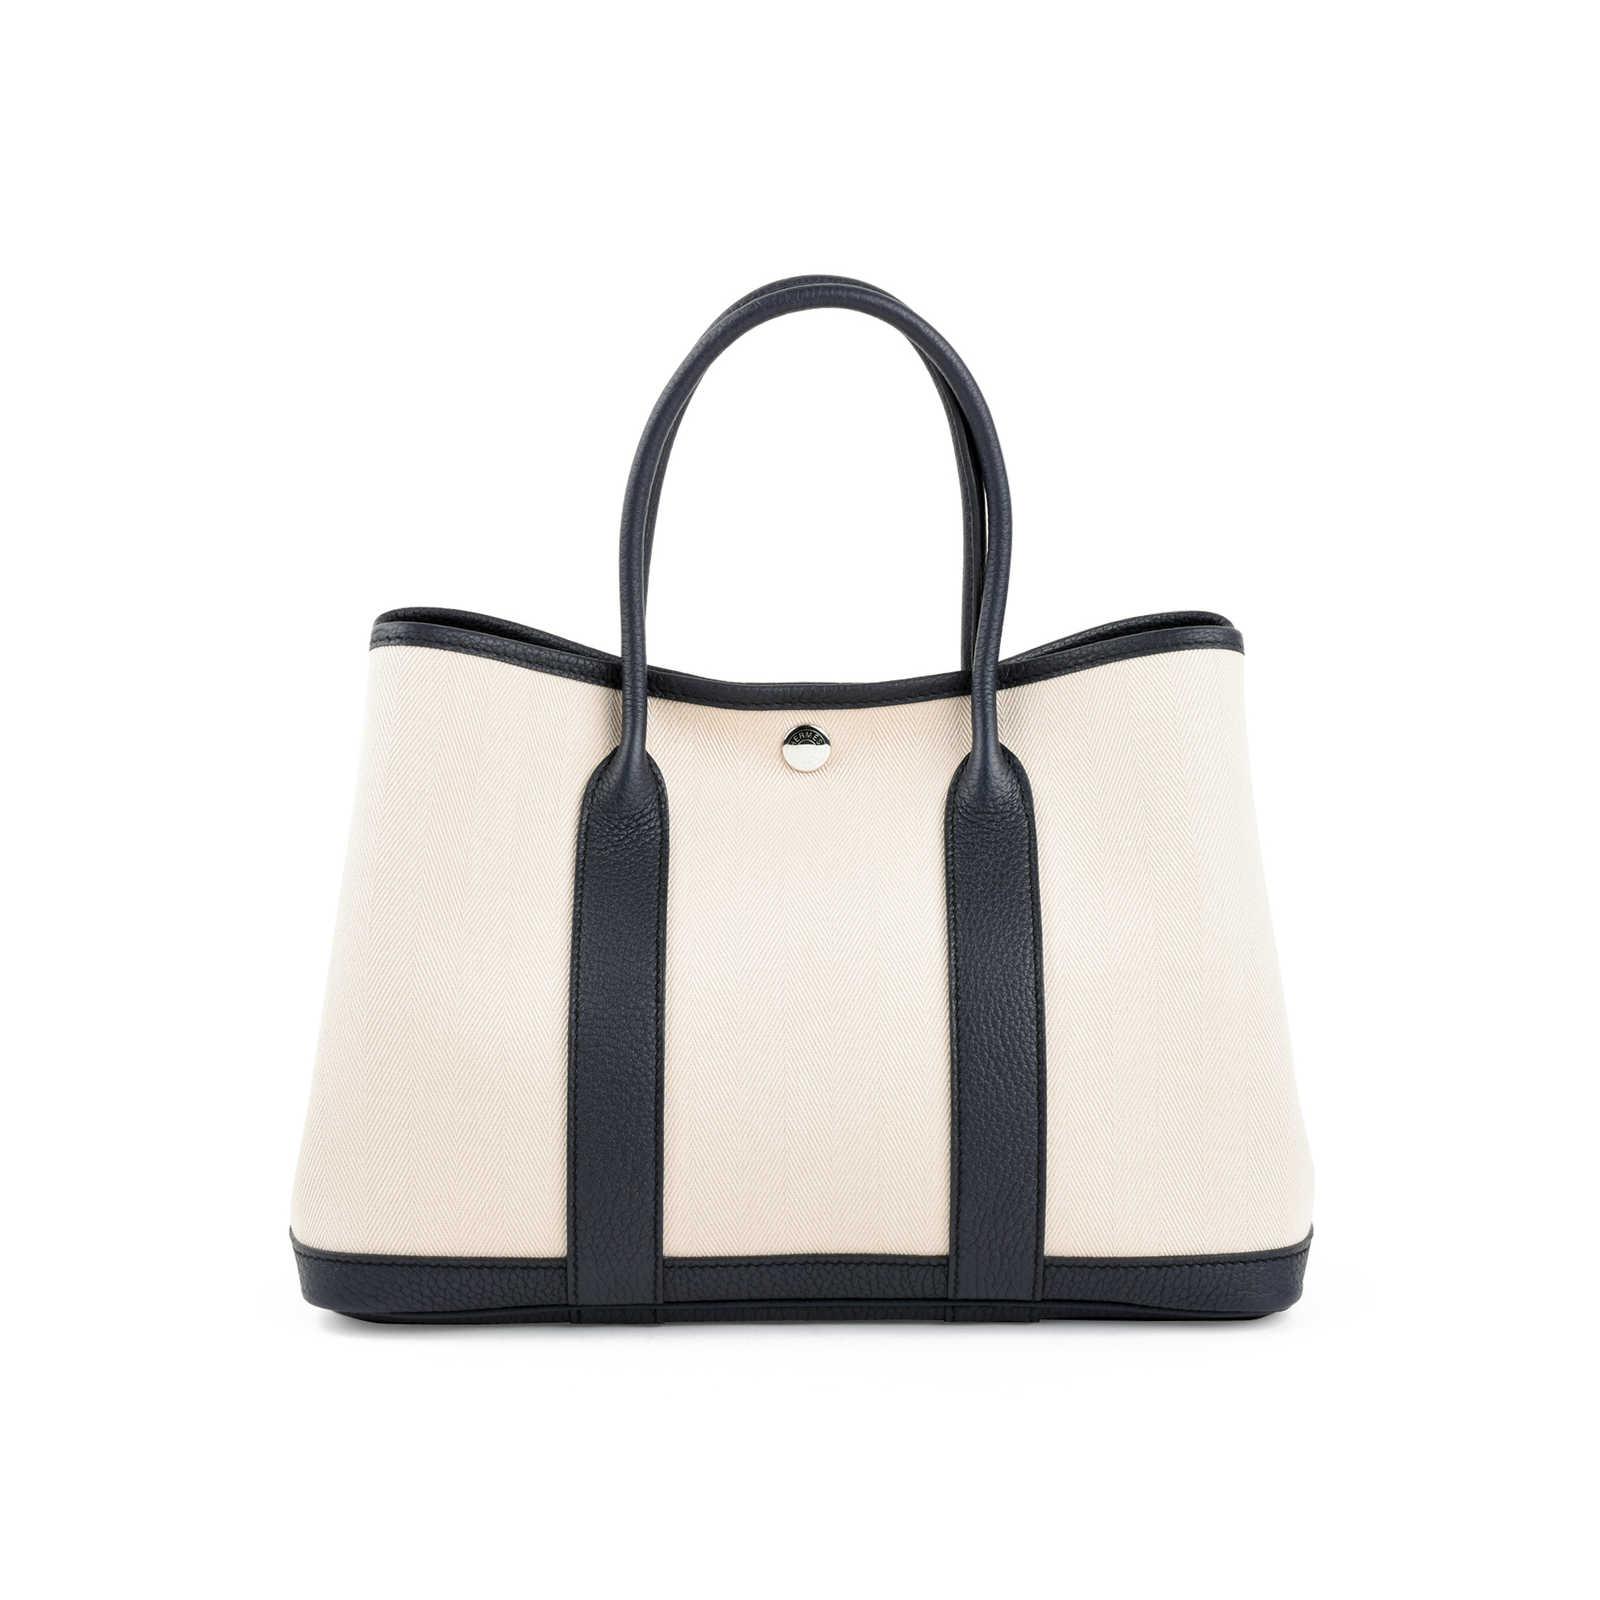 ... Authentic Second Hand Hermès Garden Party 30 Bag (PSS-291-00014) ... 32b9f73929b2a